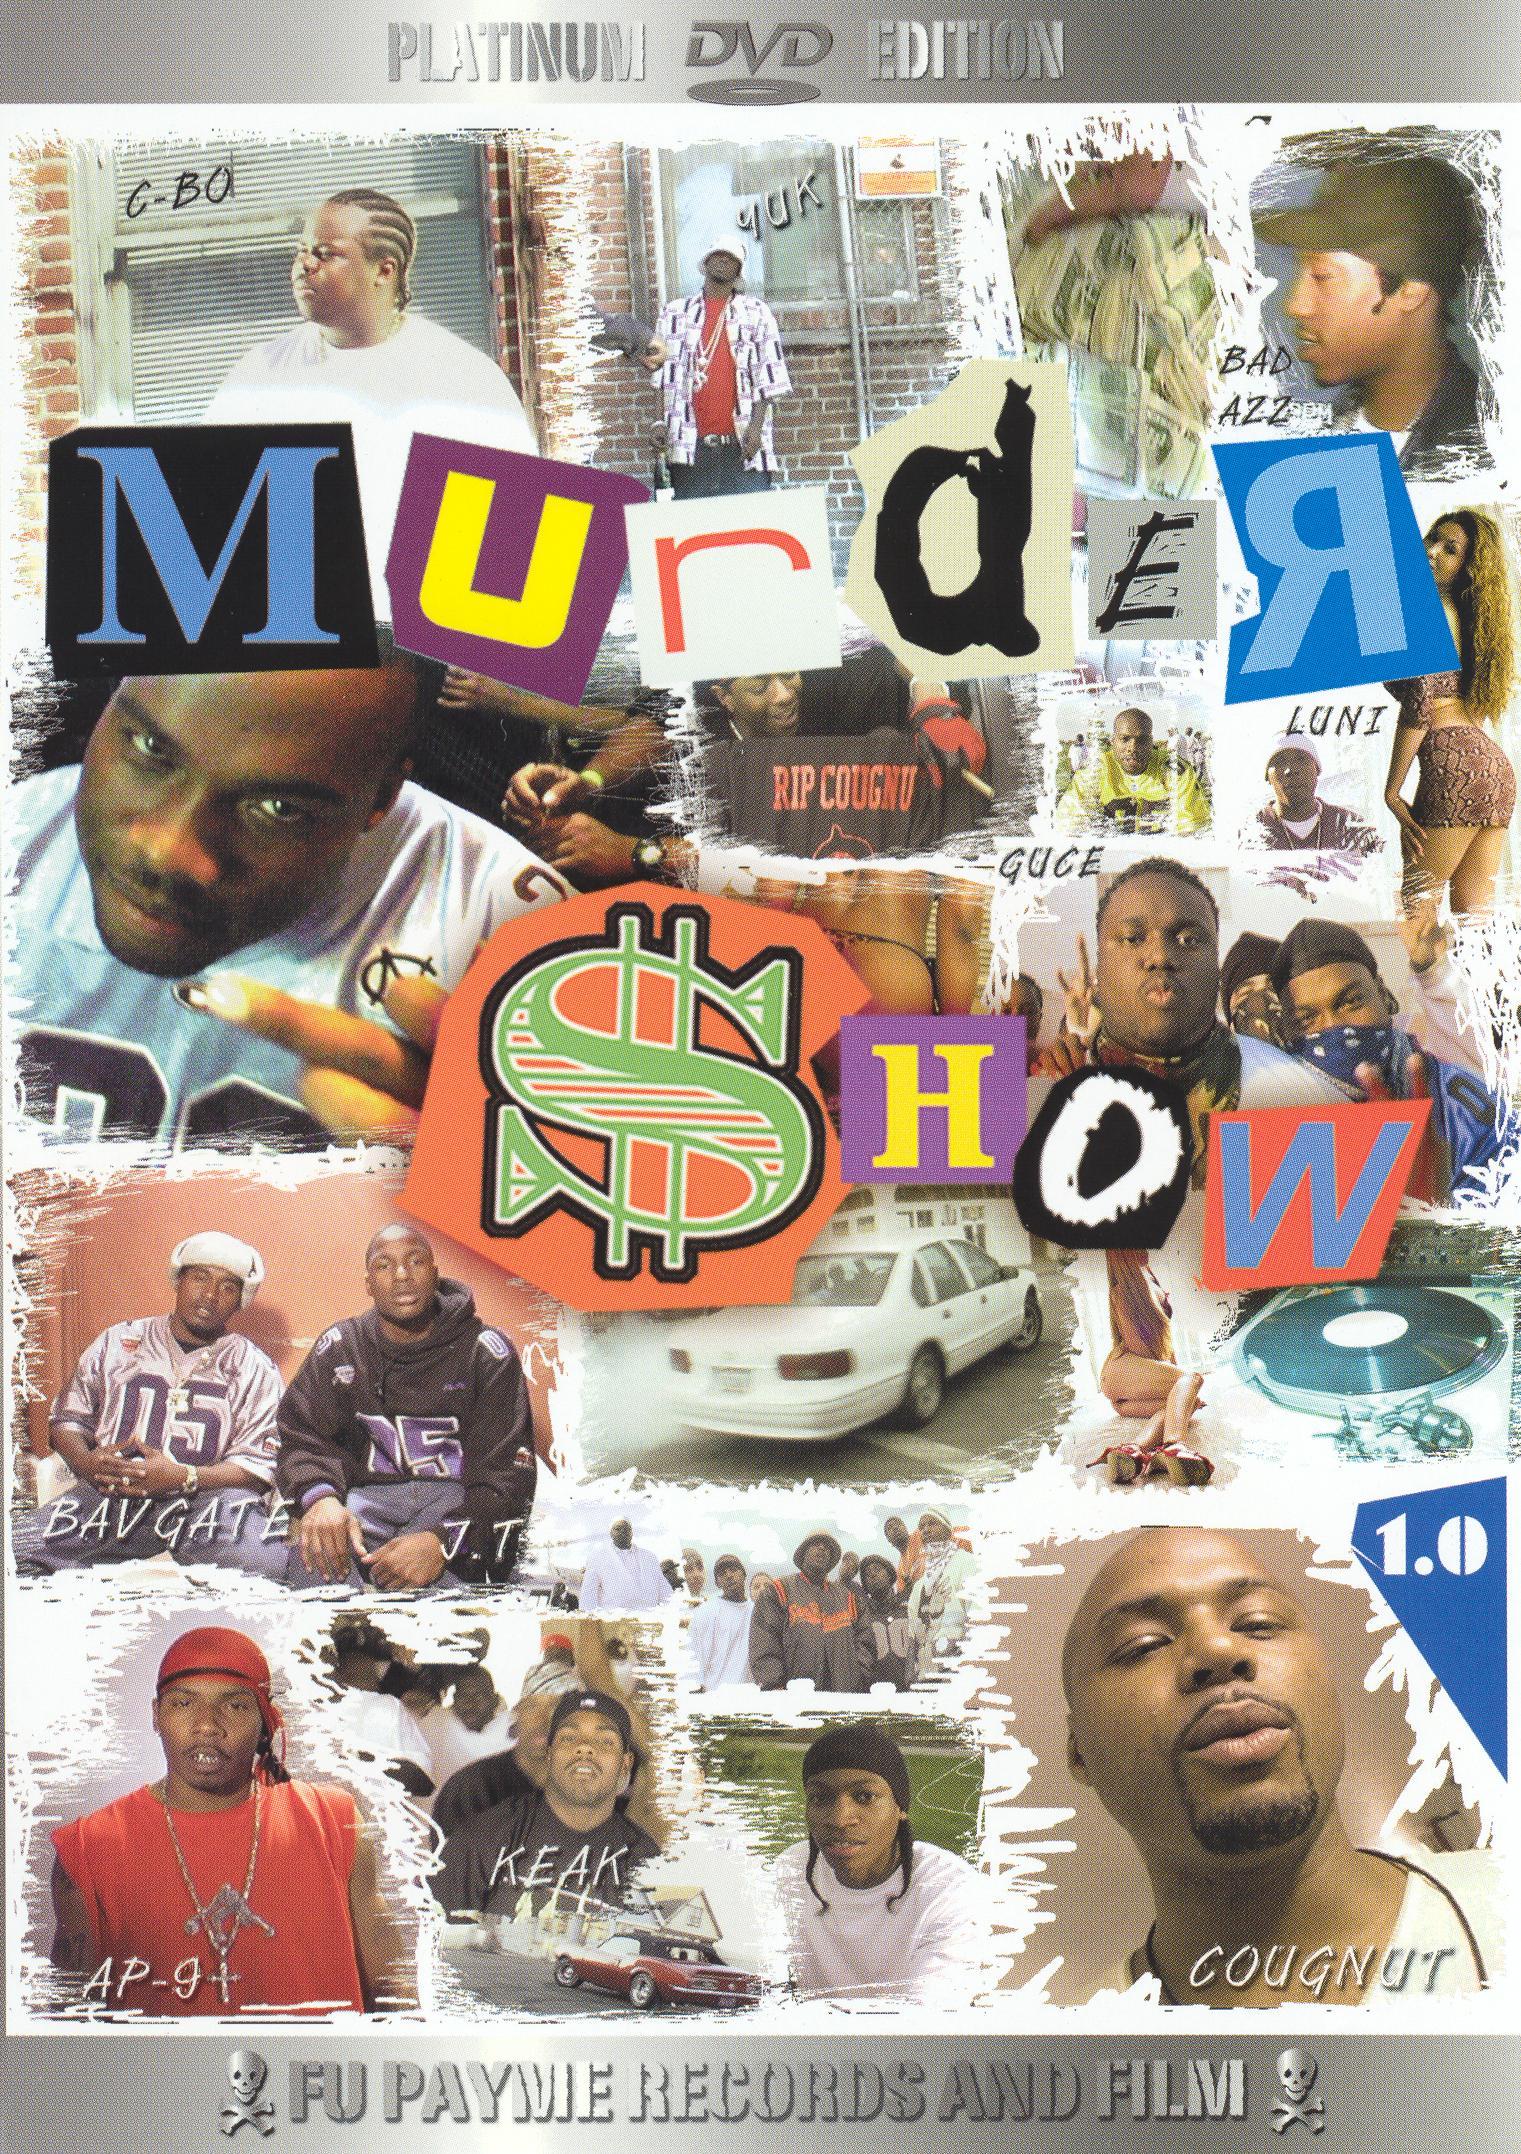 The Murder Show!